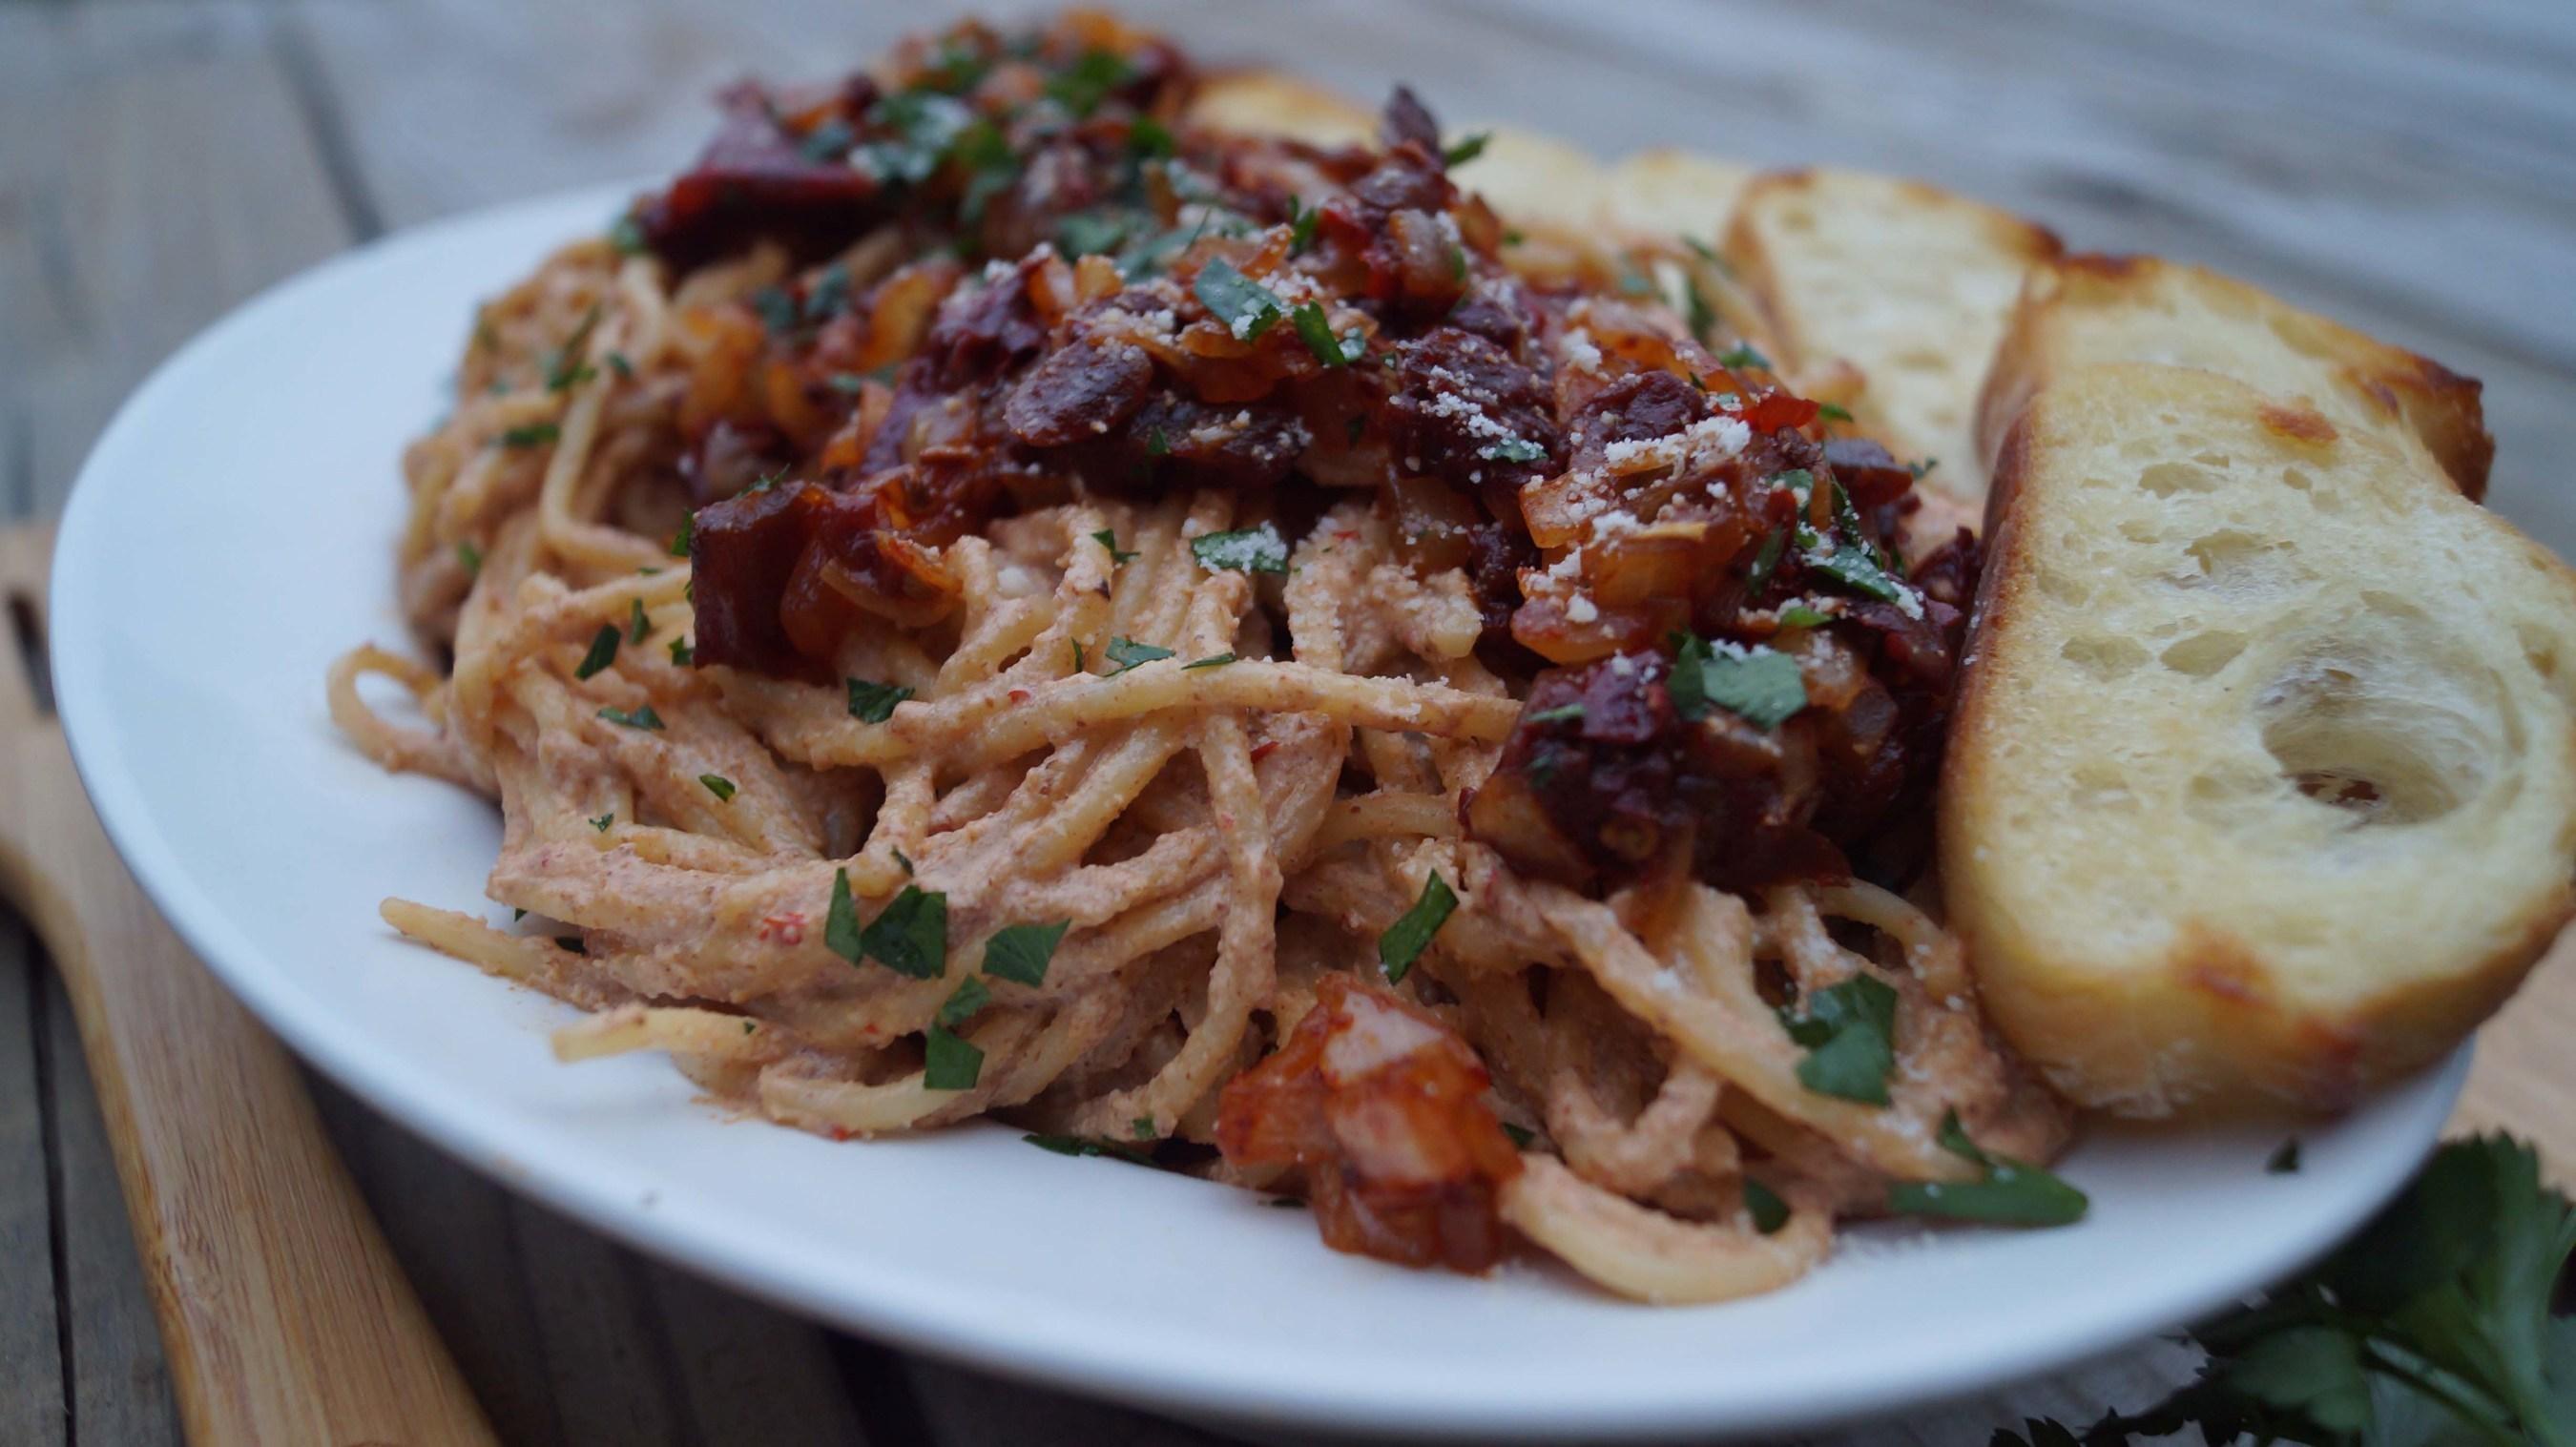 Barilla Celebrates the Holidays with Latin-Inspired Recipes like Barilla Spaghetti with Pecan Chipotle Sauce